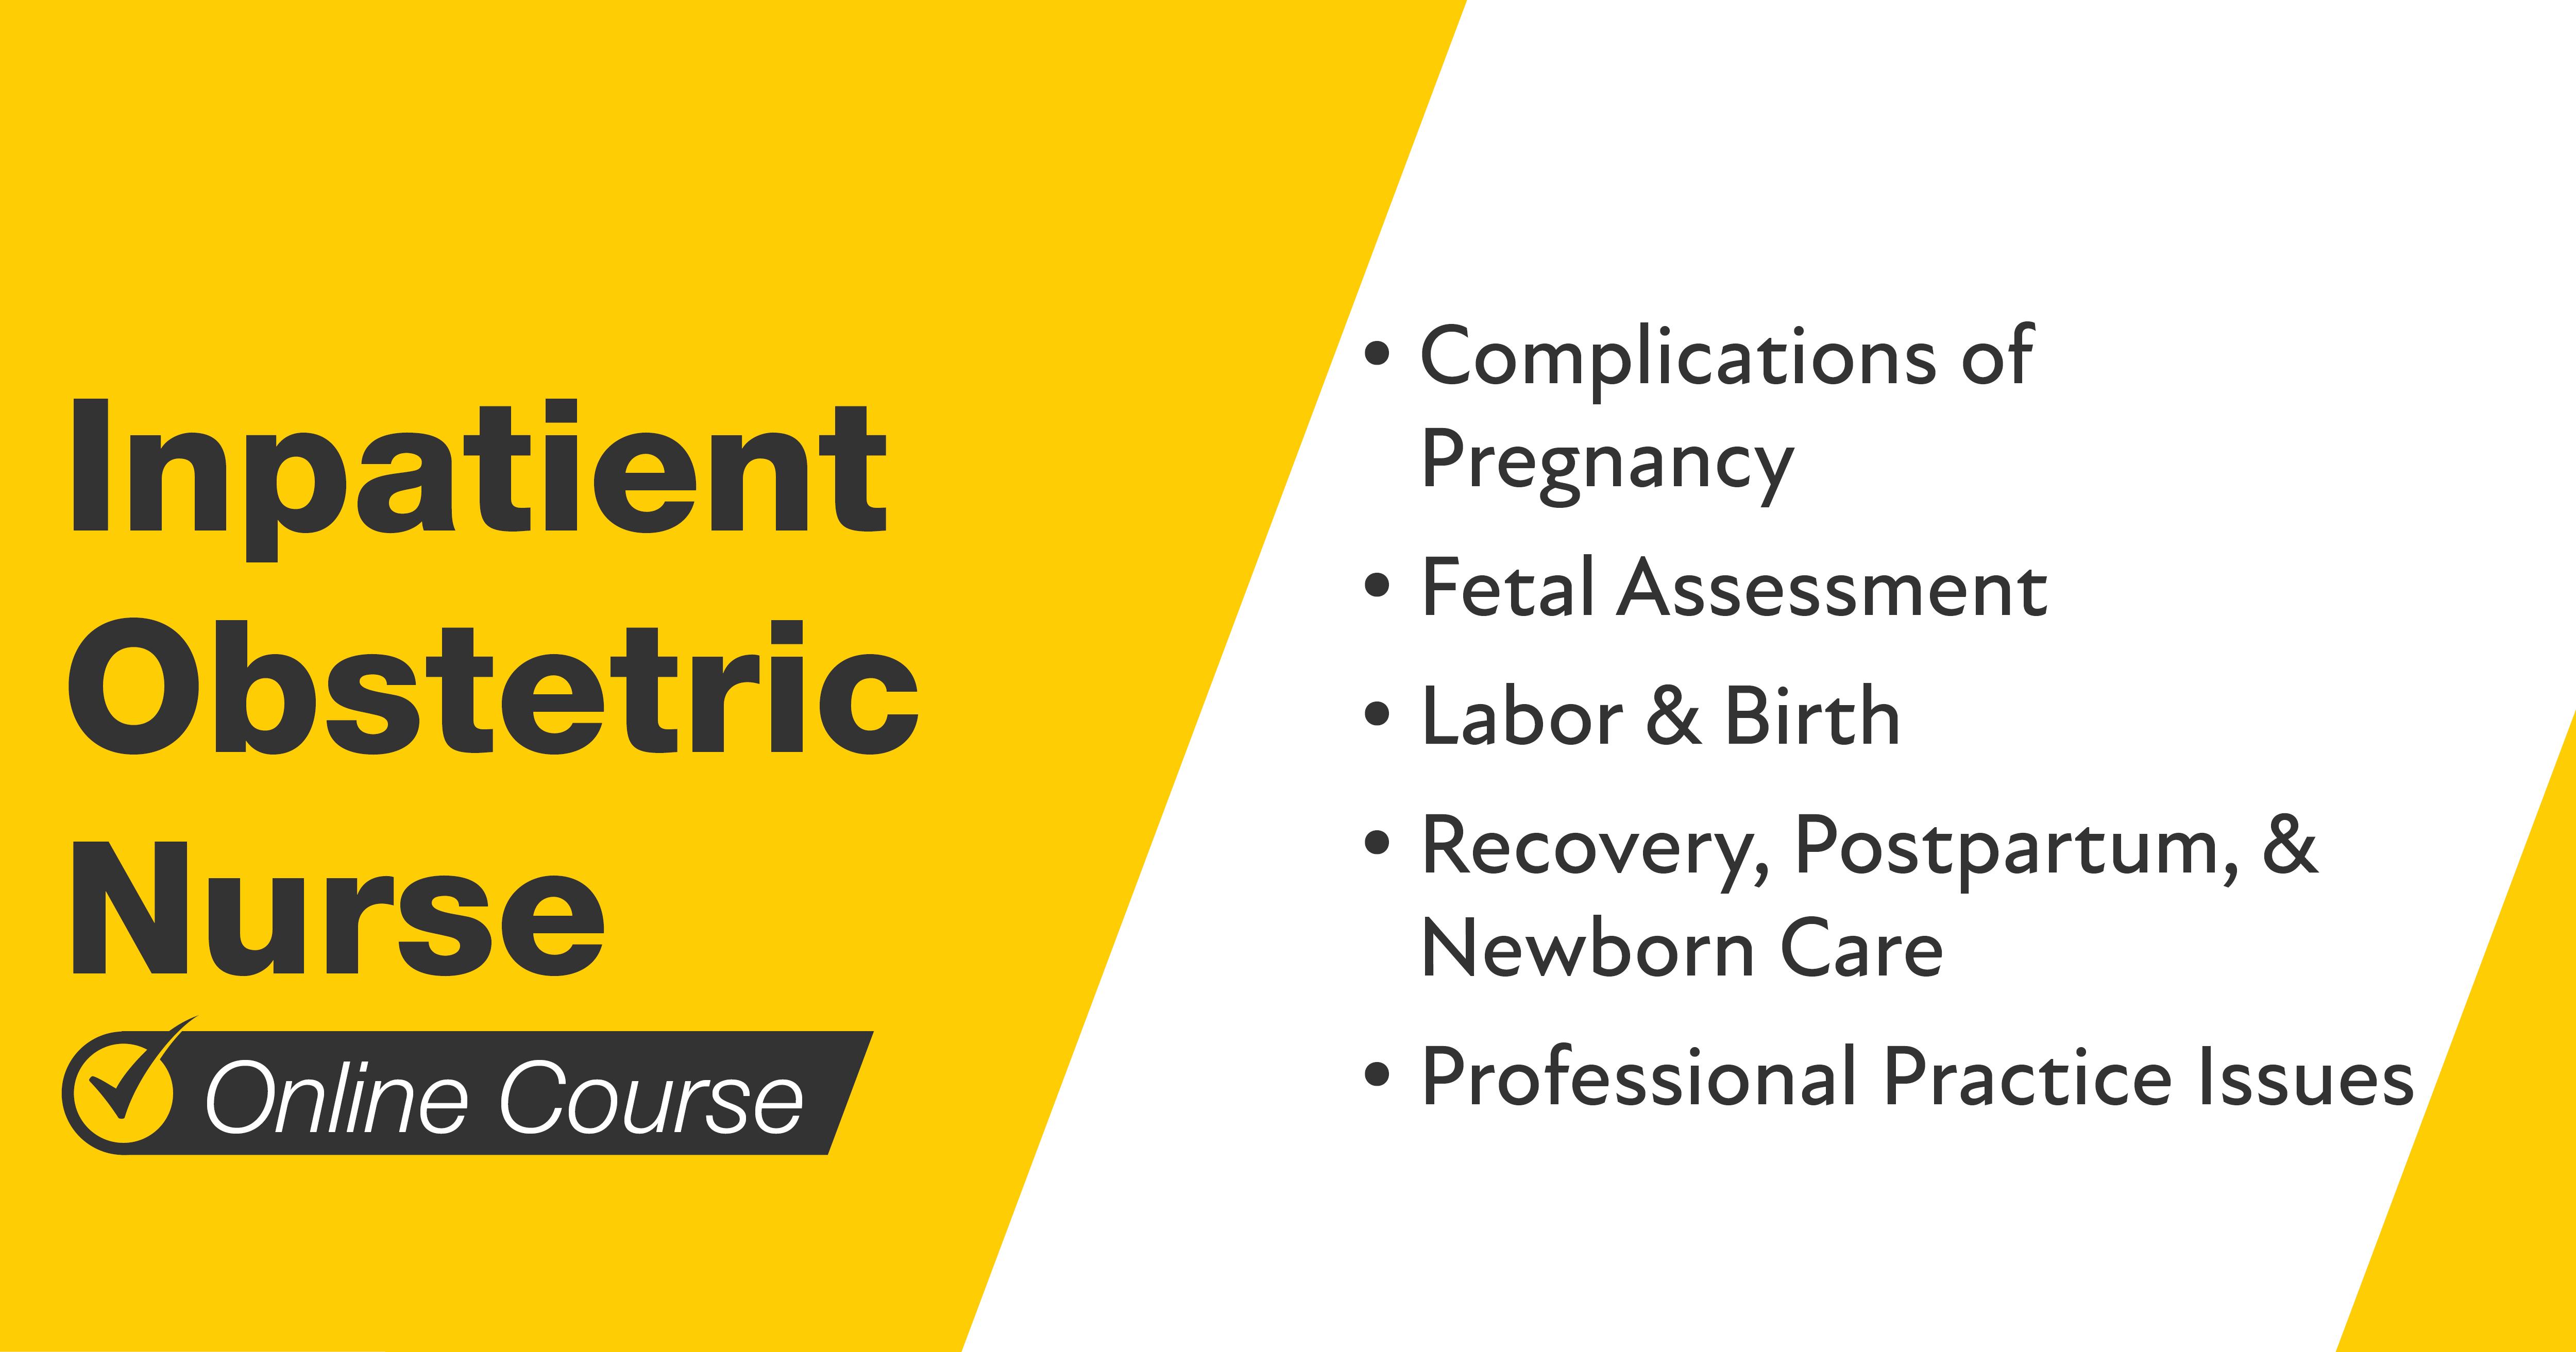 Mometrix Inpatient Obstetric Nurse Course